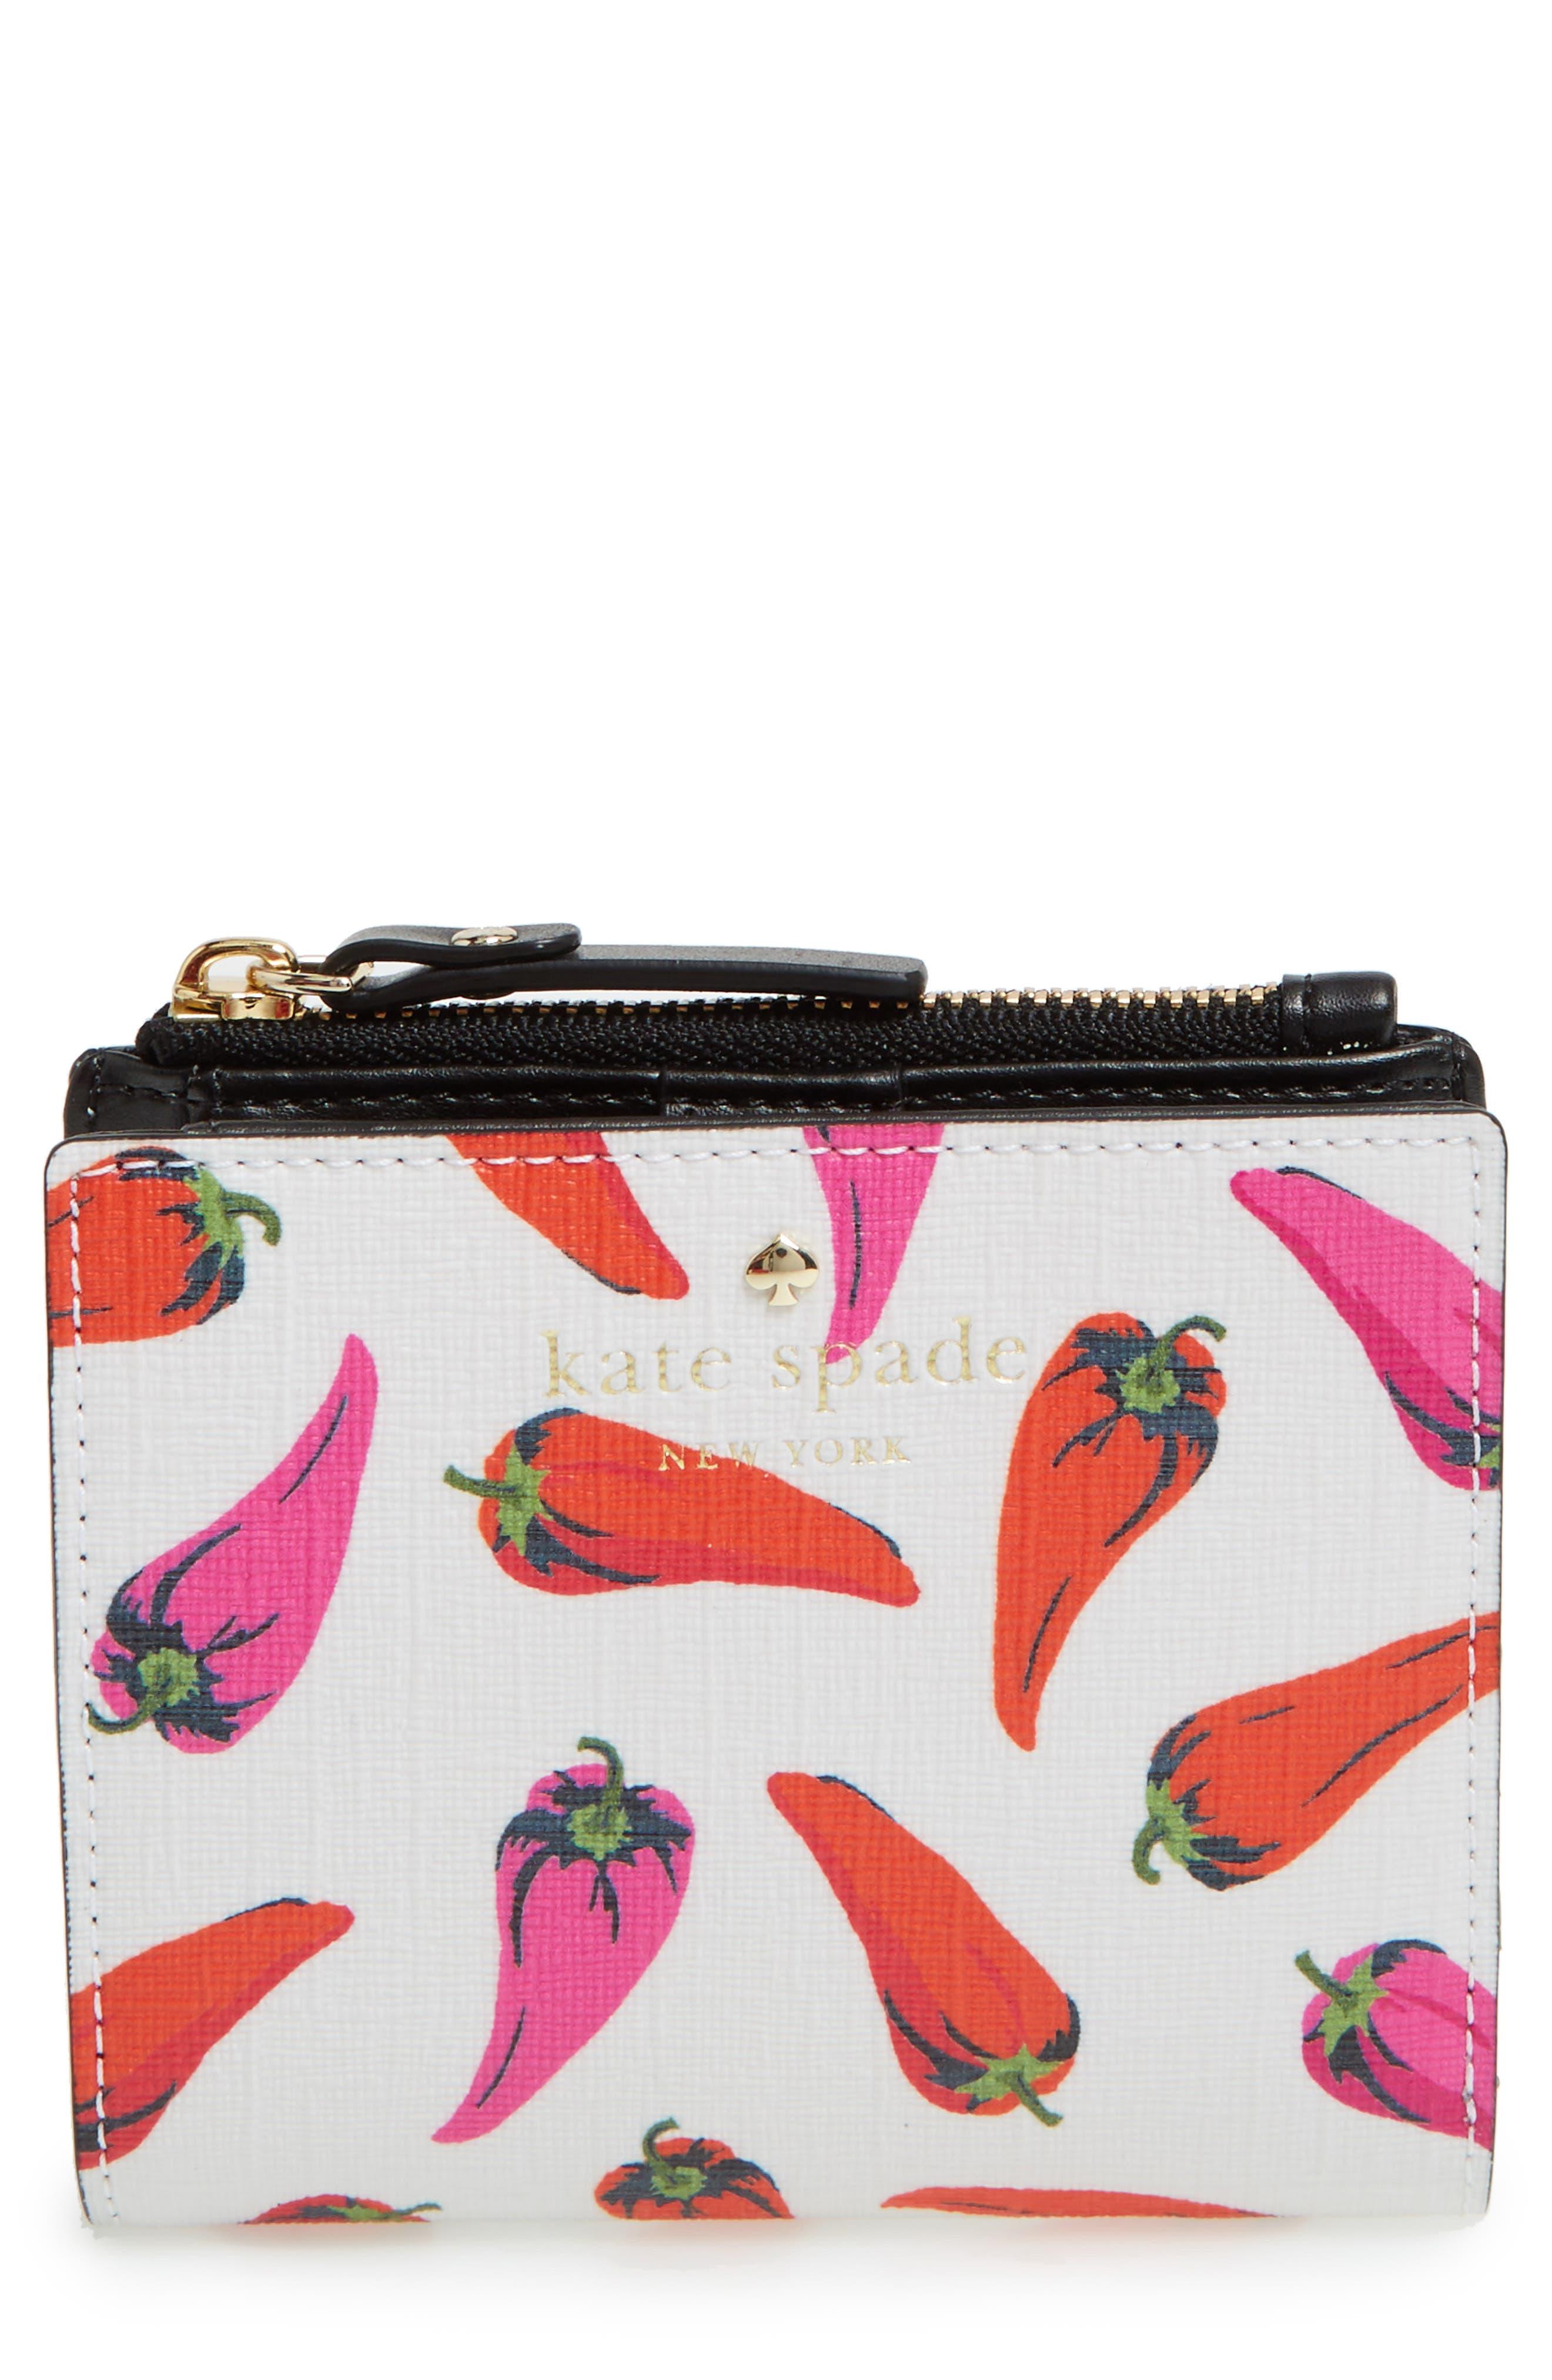 kate spade new york adalyn hot pepper faux leather wallet